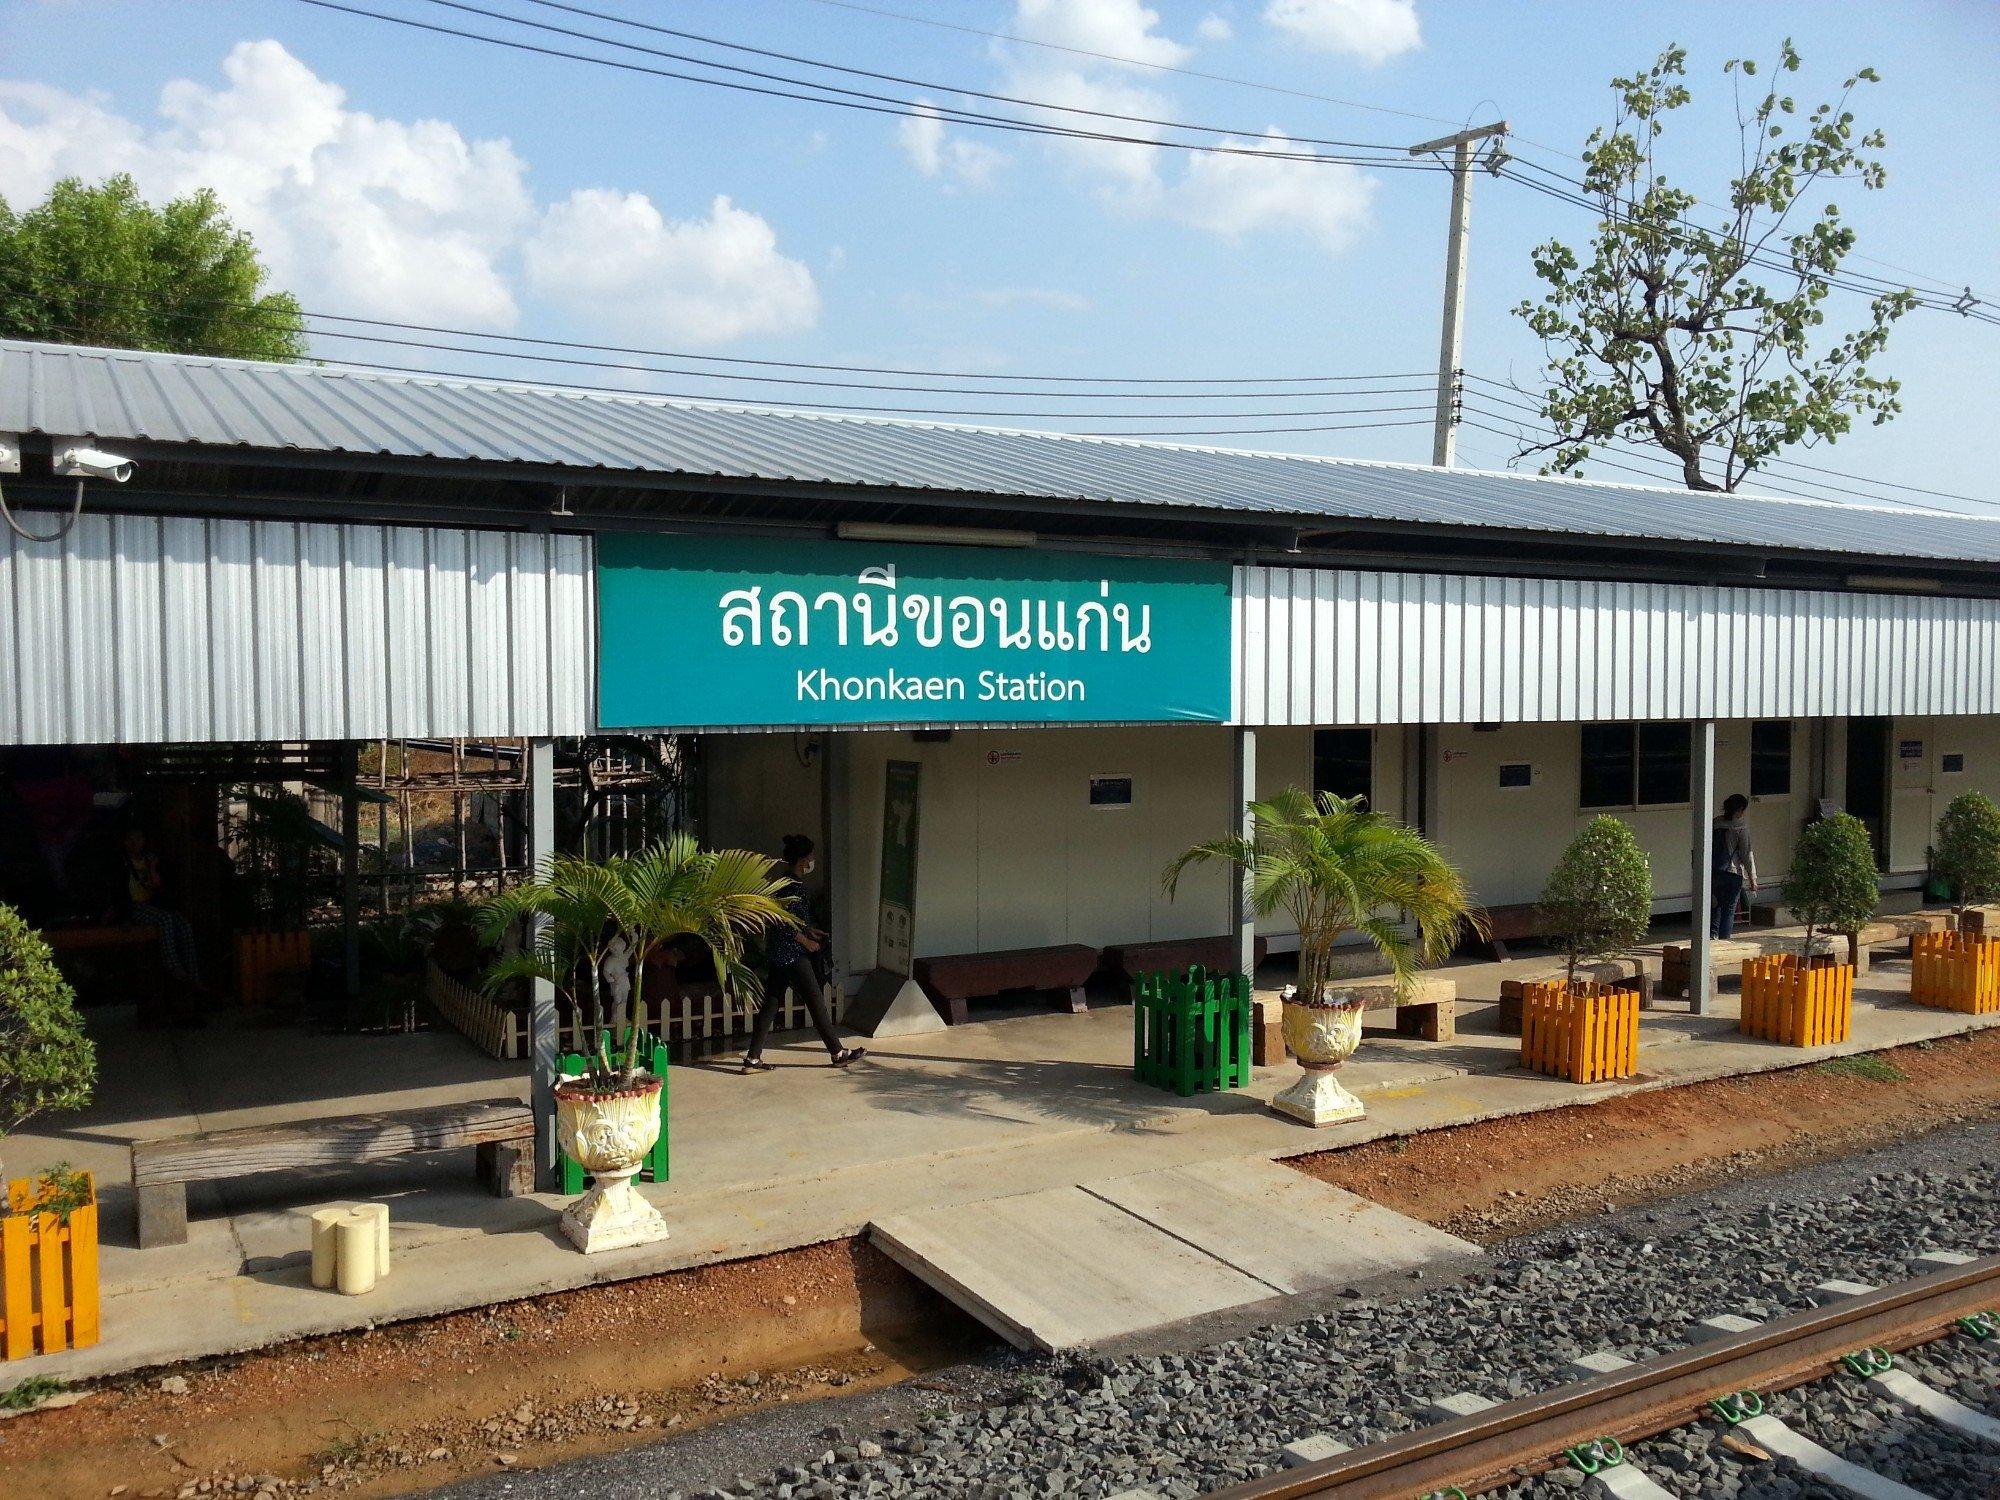 Khon Kaen Temporary Railway Station